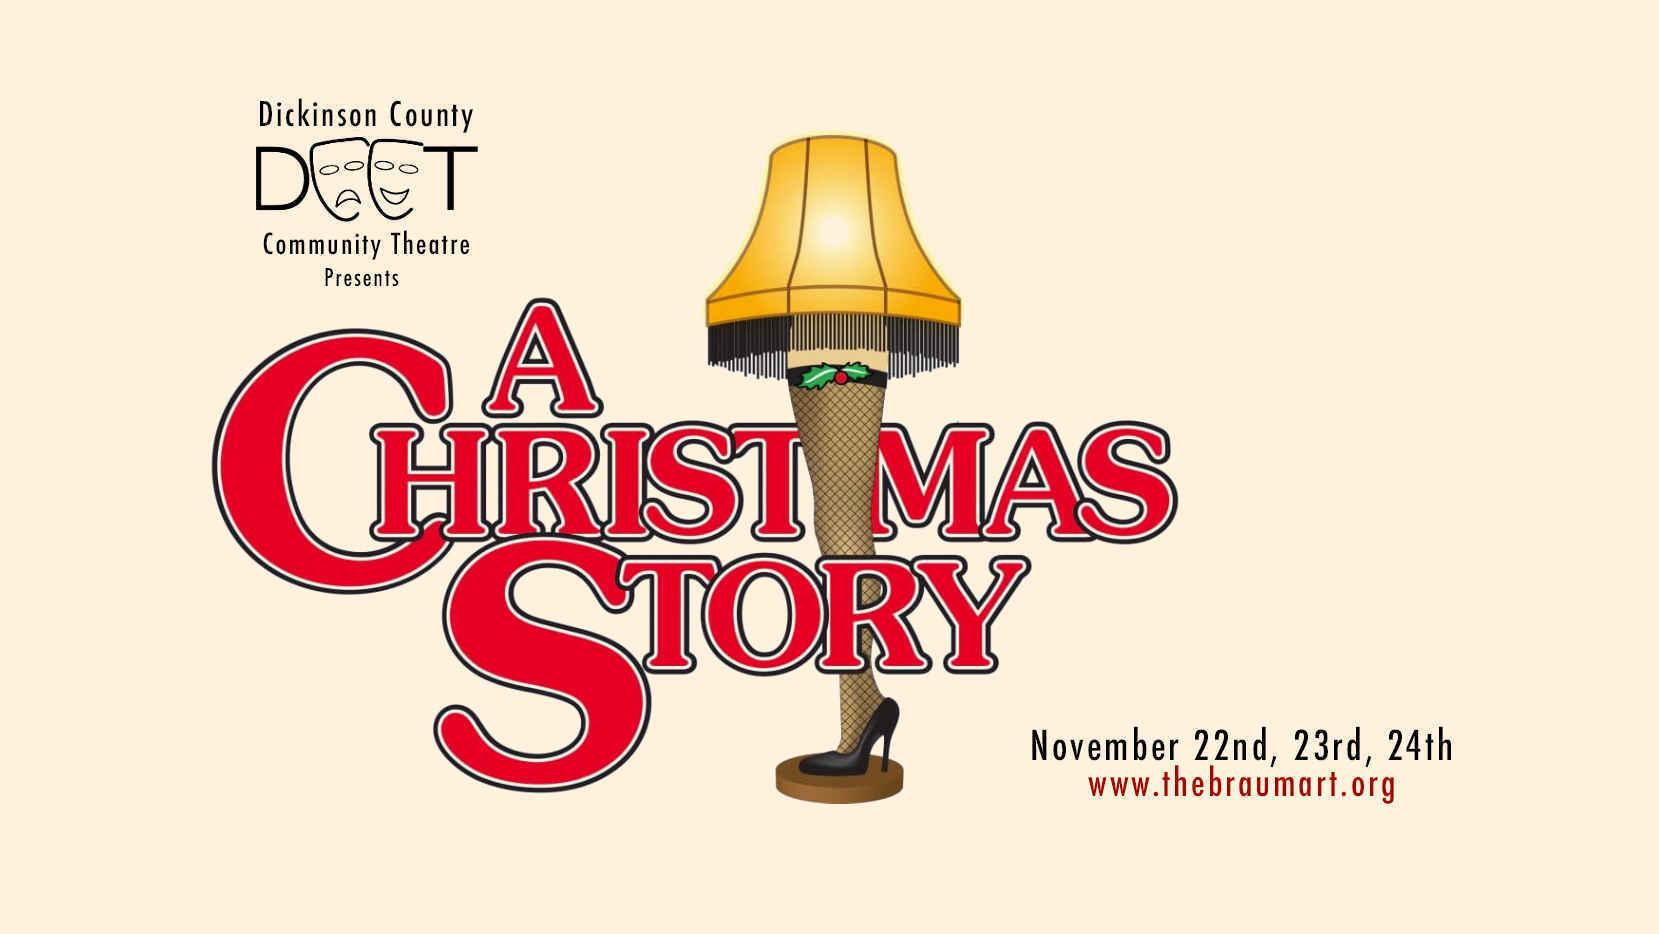 DCCT Presents A Christmas Story (November 23rd Matinee) image